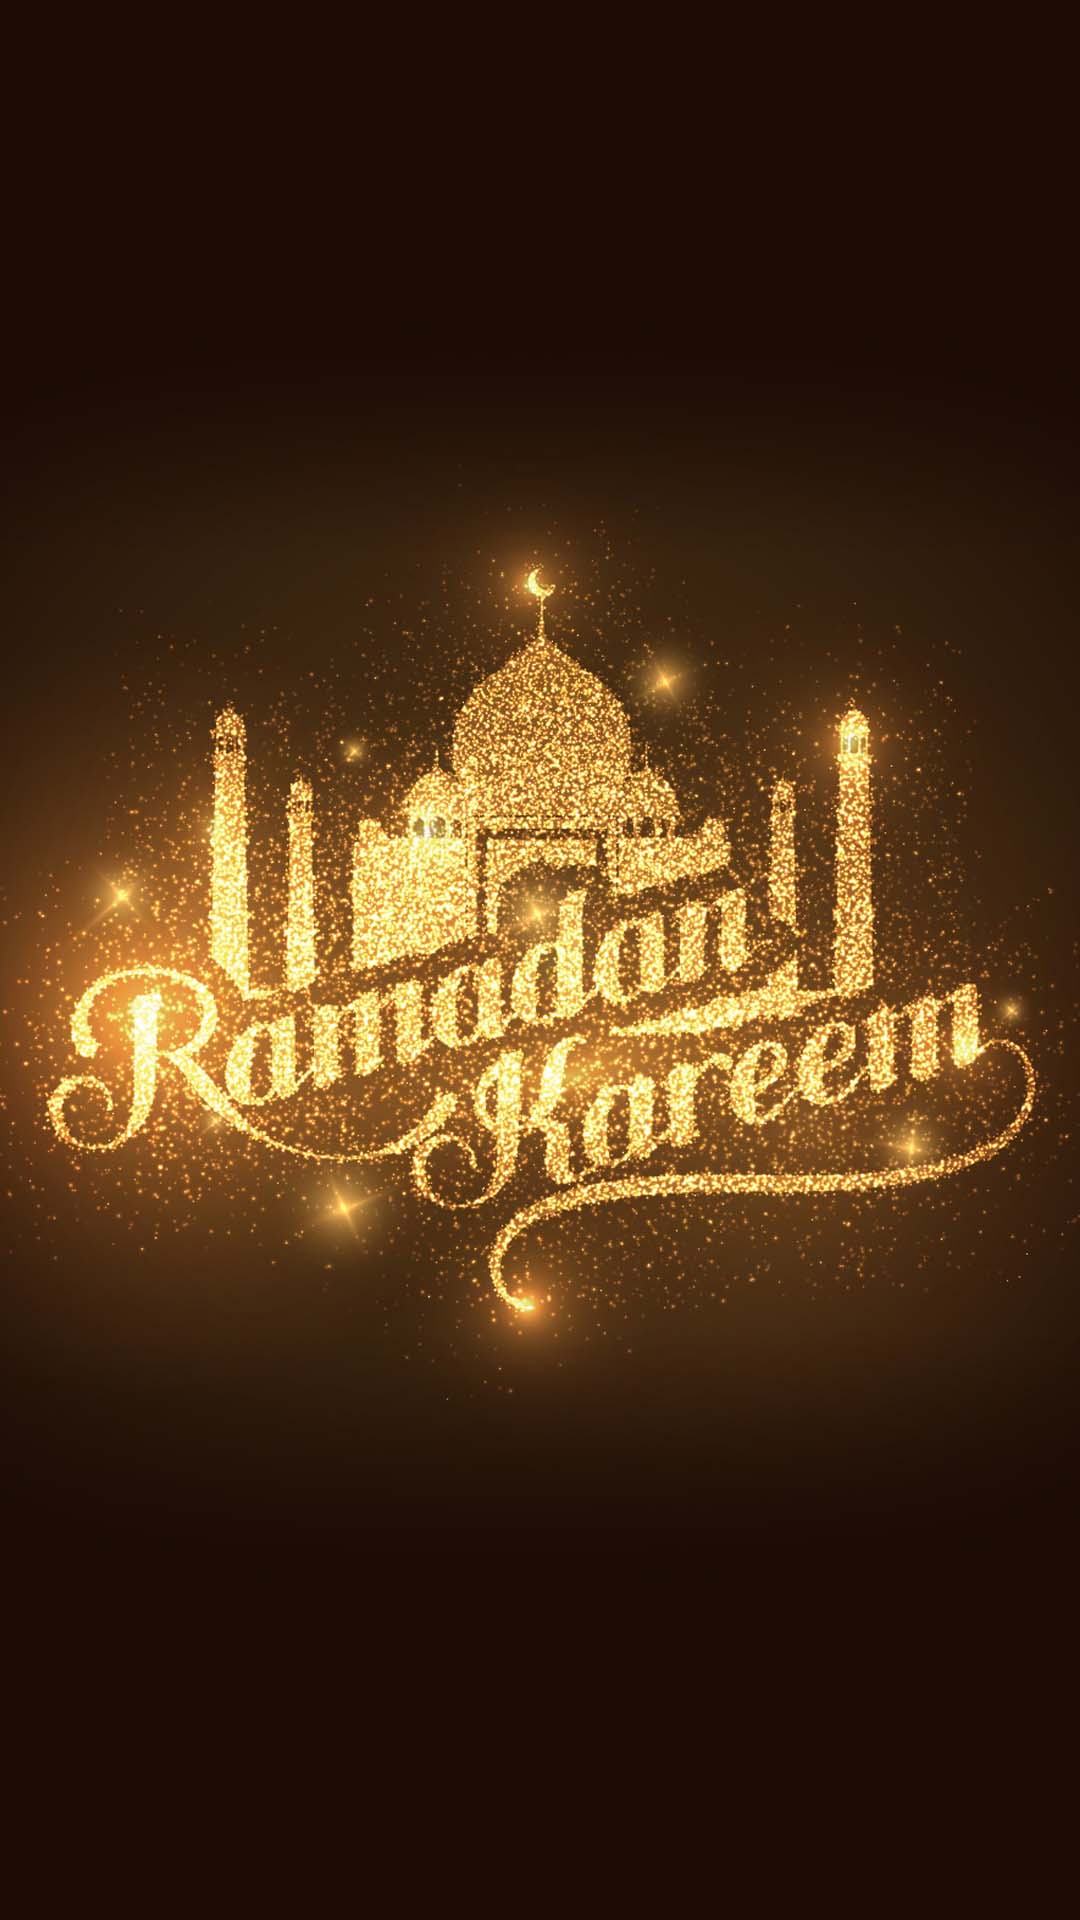 خلفيات موبايل رمضان كريم Mobile Wallpapers HD 17 خلفيات موبايل رمضان كريم Mobile Wallpapers HD